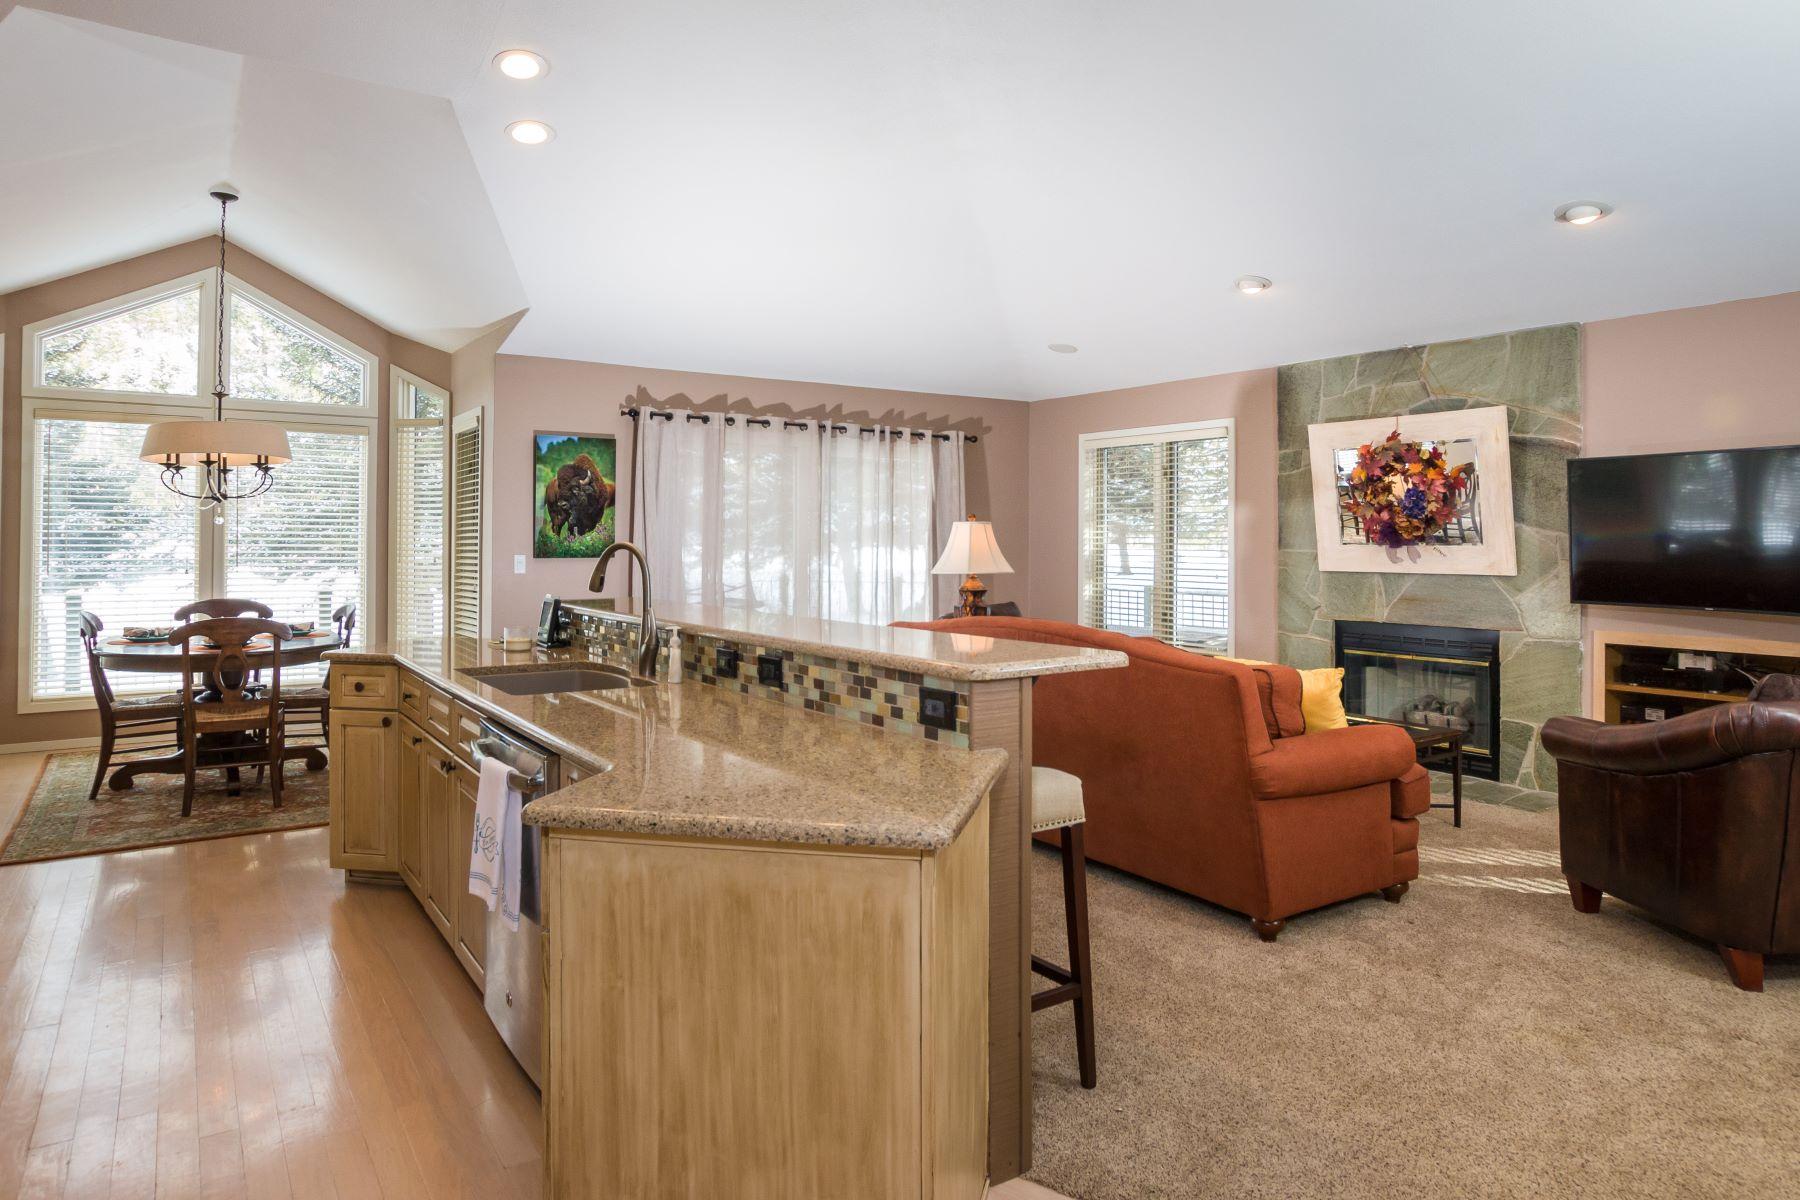 Additional photo for property listing at 163 Golf Terr , Bigfork, MT 59911 163  Golf Terr Bigfork, Montana 59911 United States